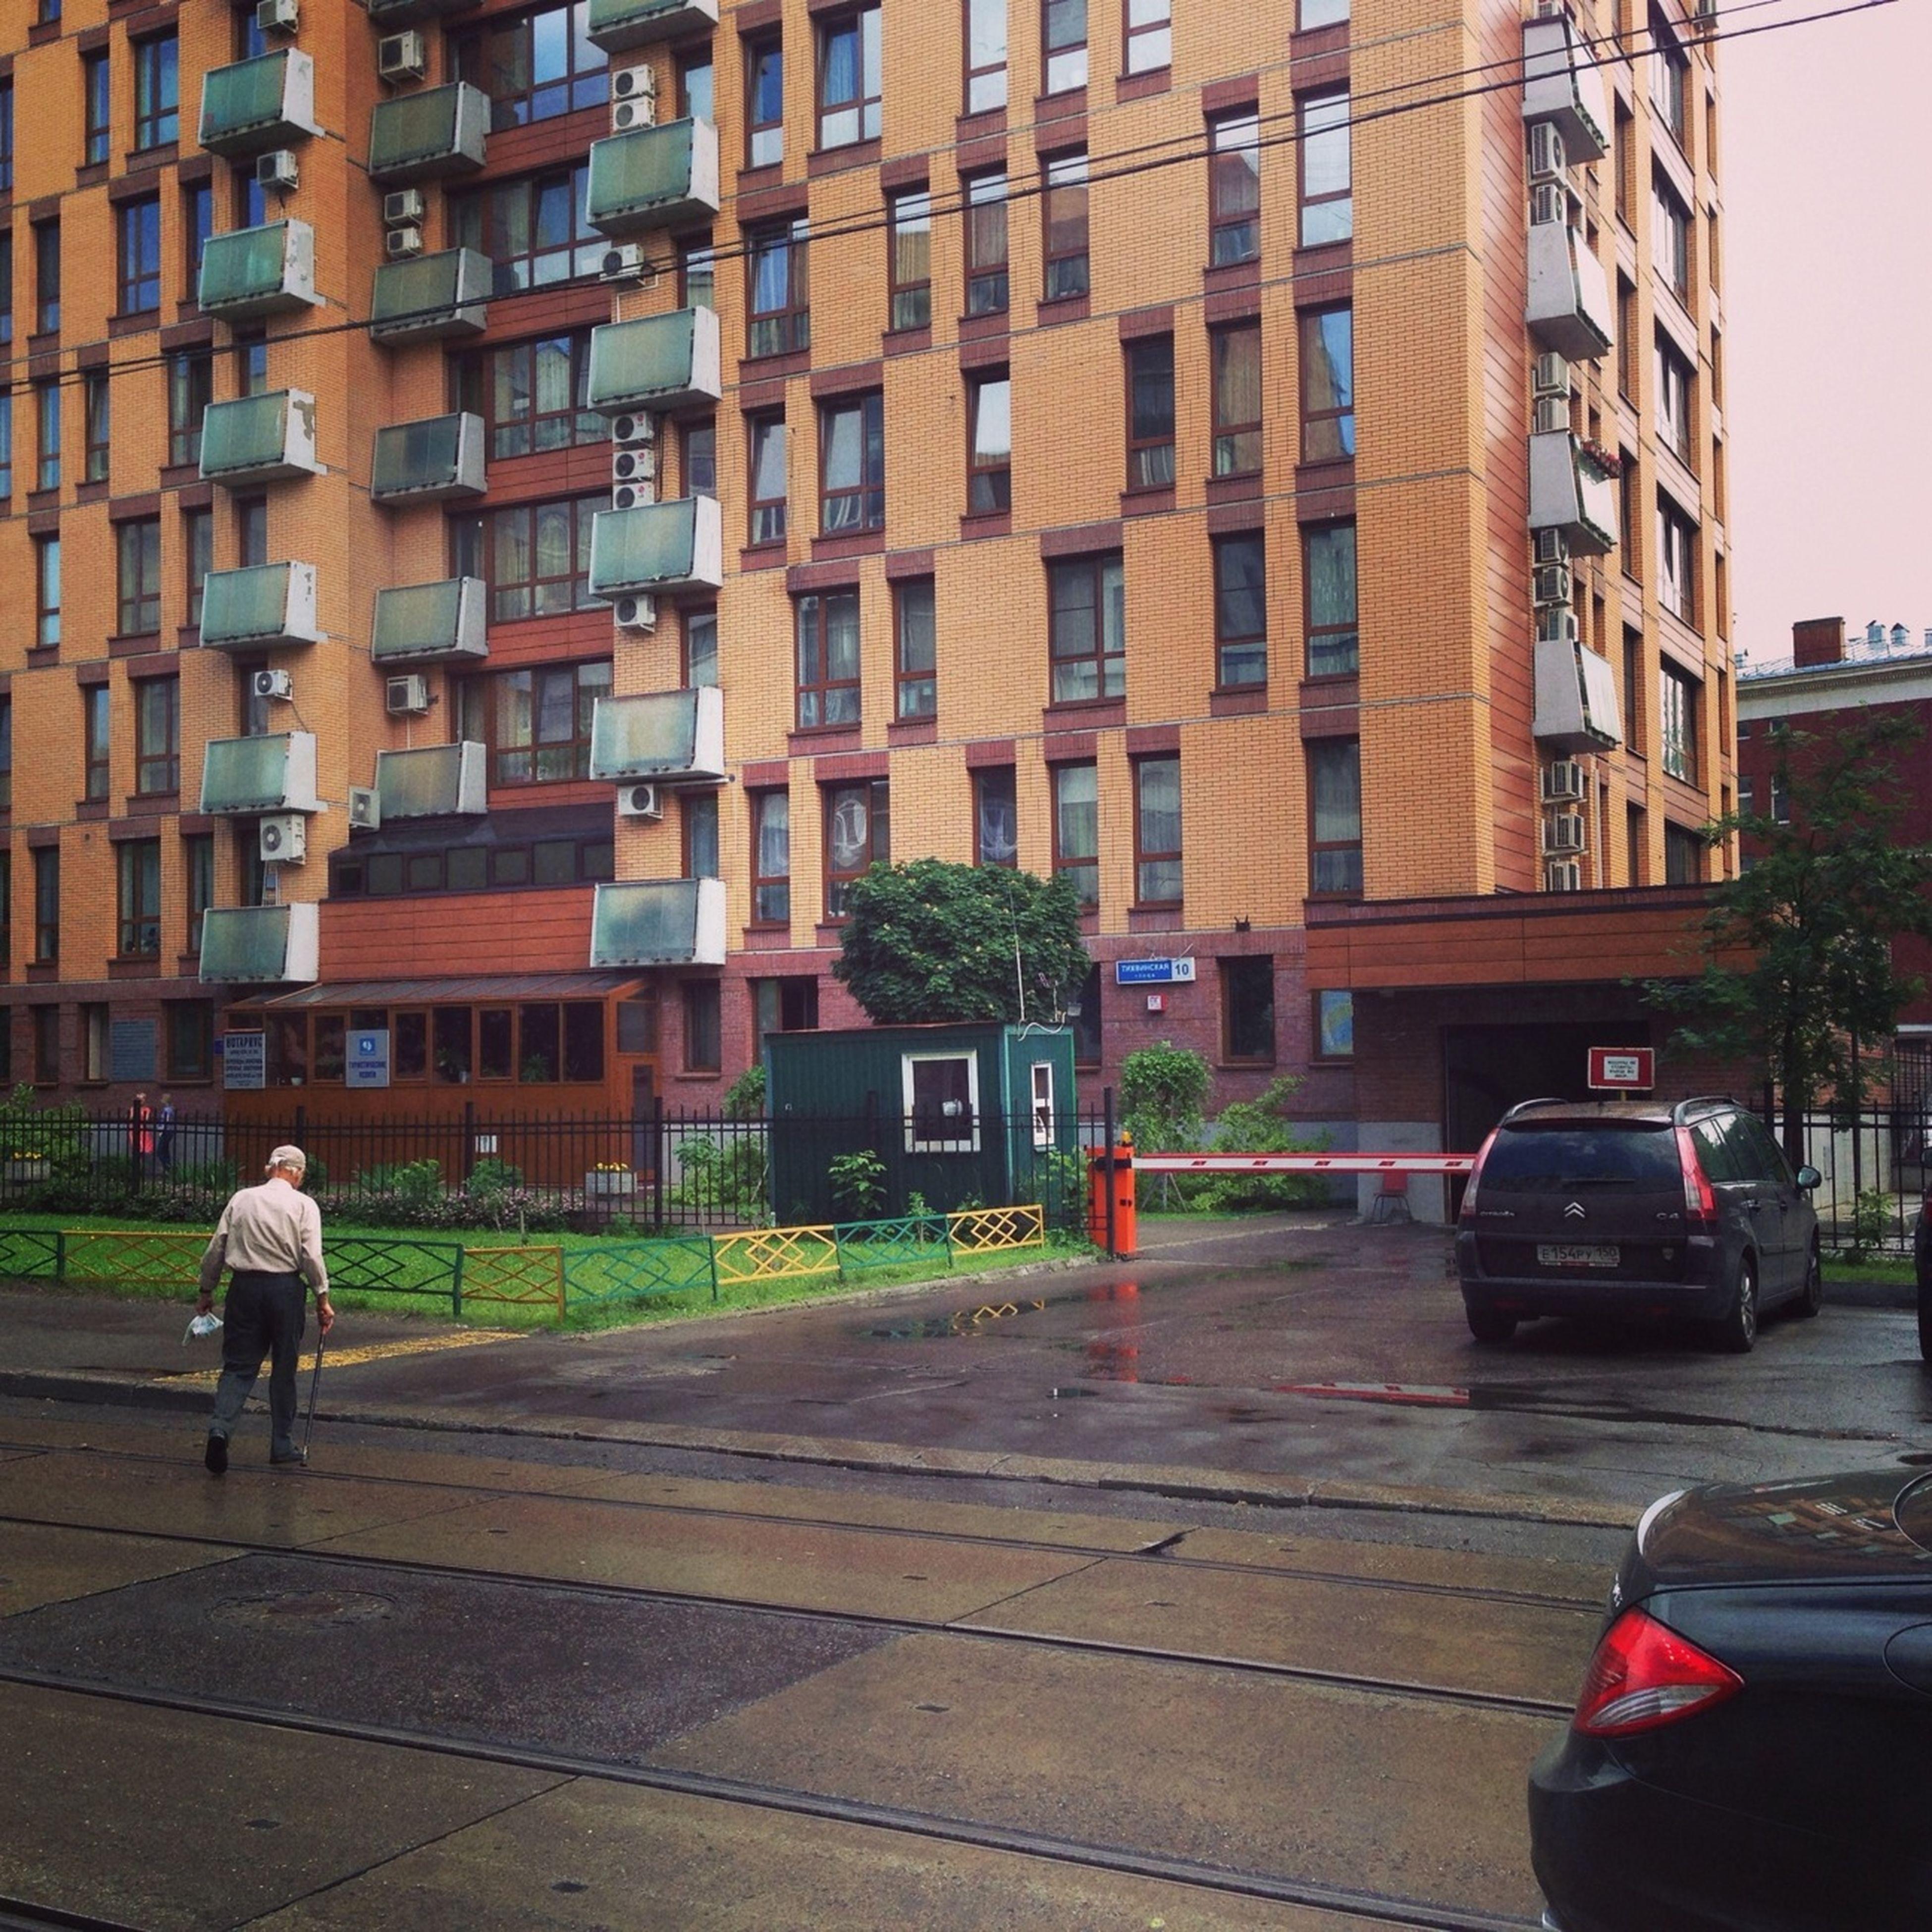 building exterior, architecture, built structure, city, street, transportation, car, land vehicle, city life, walking, mode of transport, road, men, city street, incidental people, building, person, sidewalk